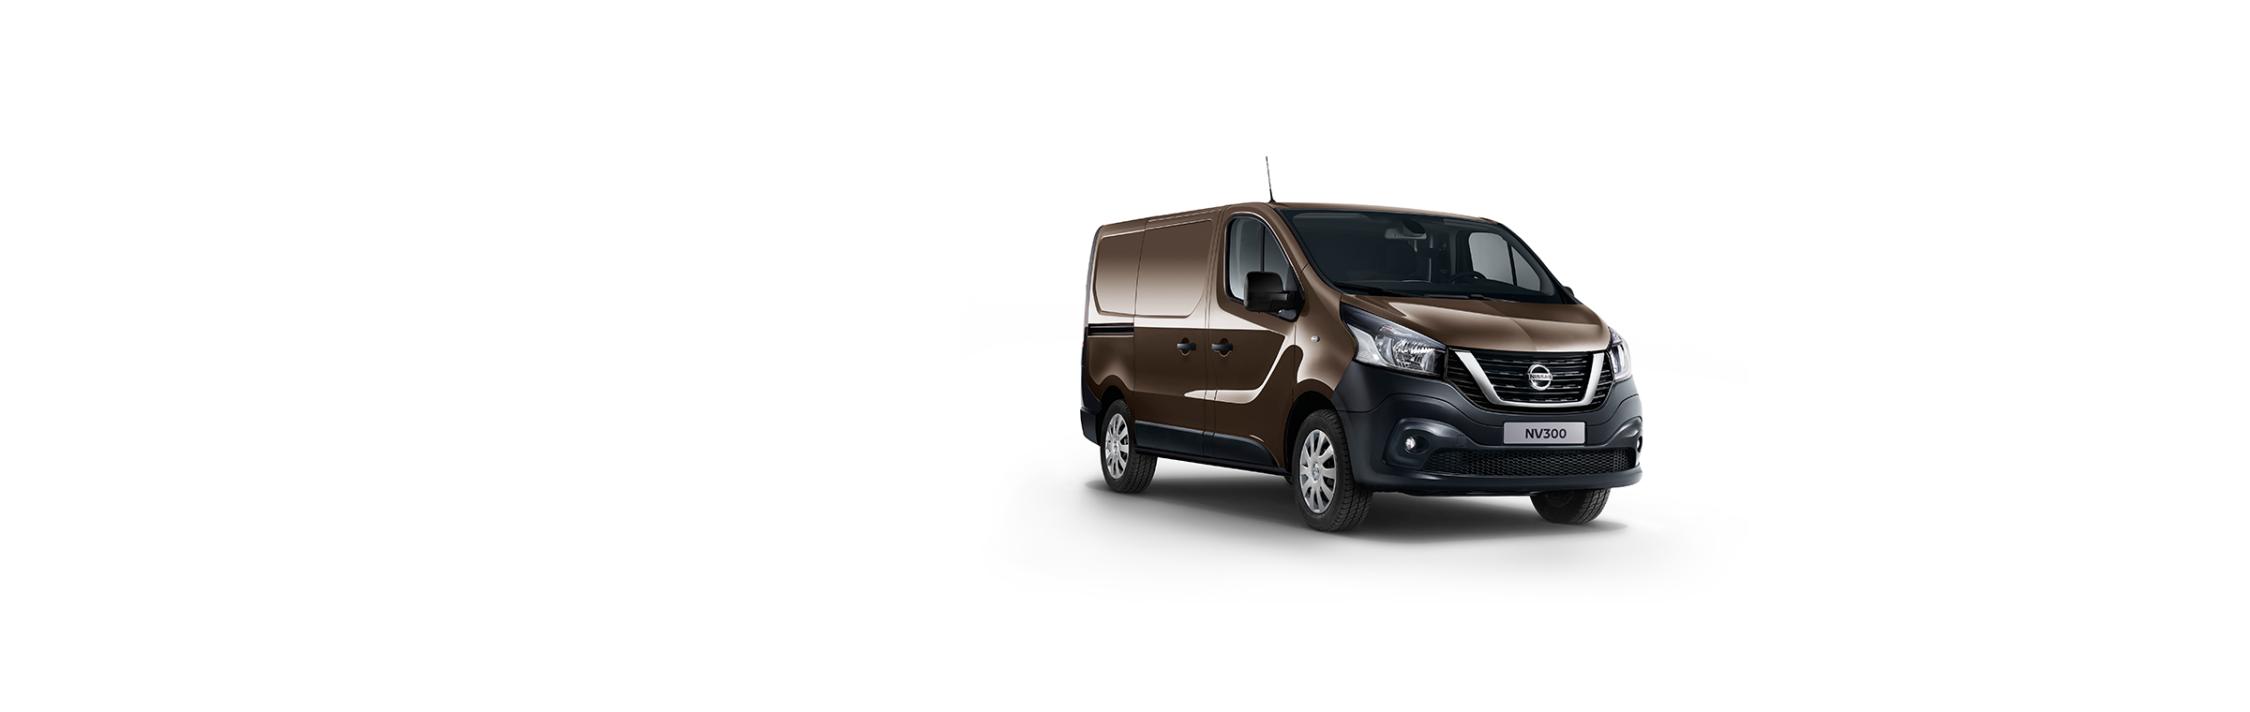 cb8025f431230 Nissan NV300 - Ludospace - Fourgon   Nissan